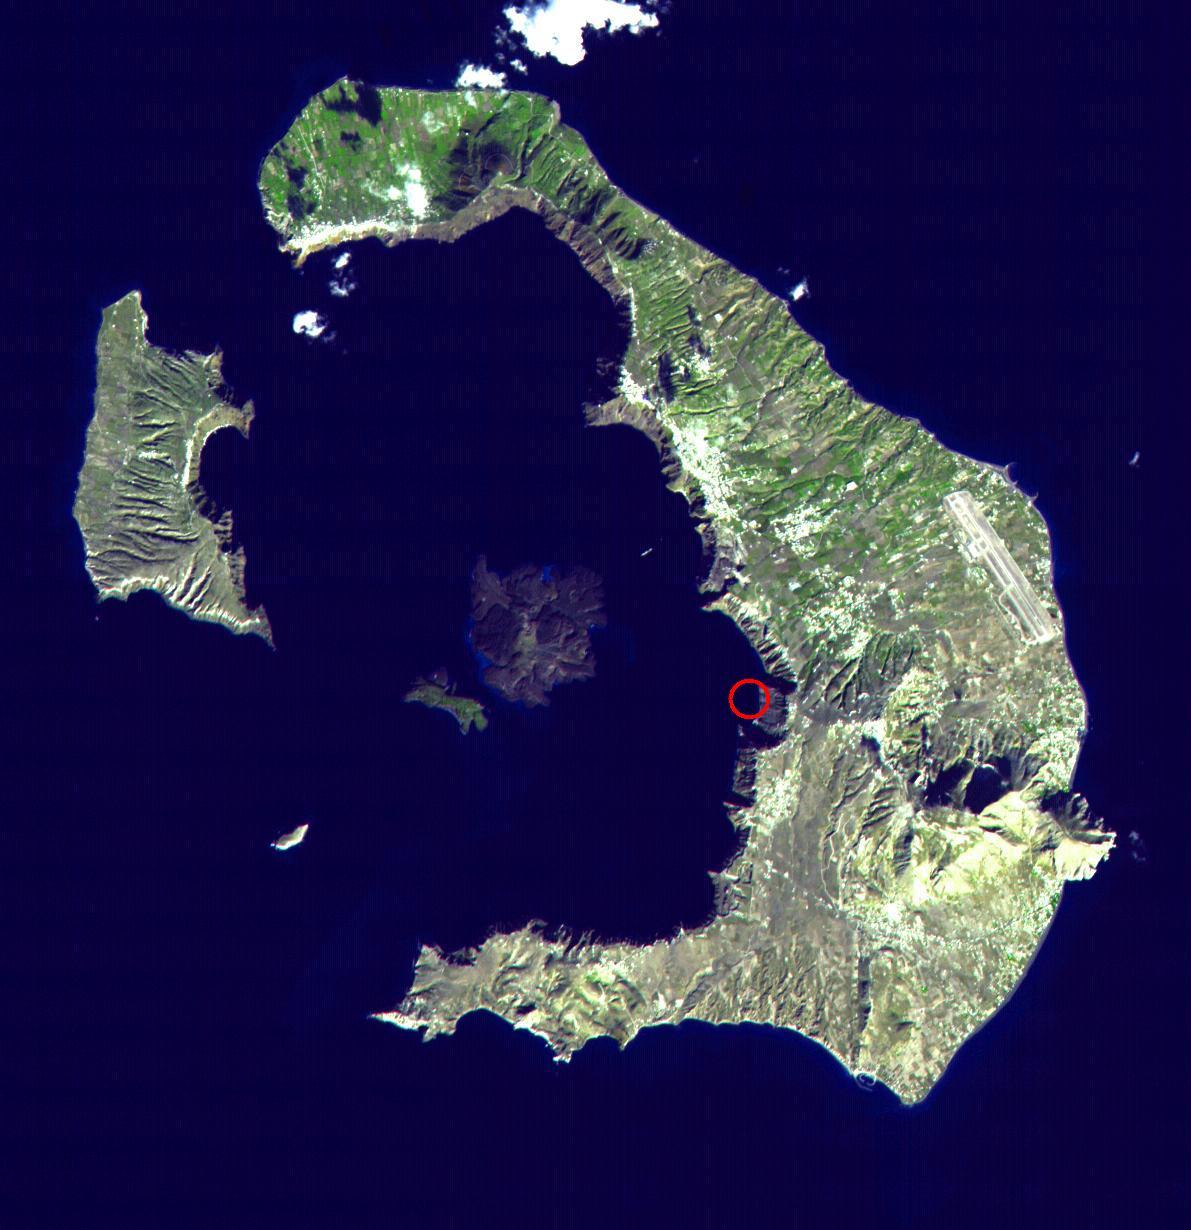 1576102740750-Santorinisea_diamond_wreck